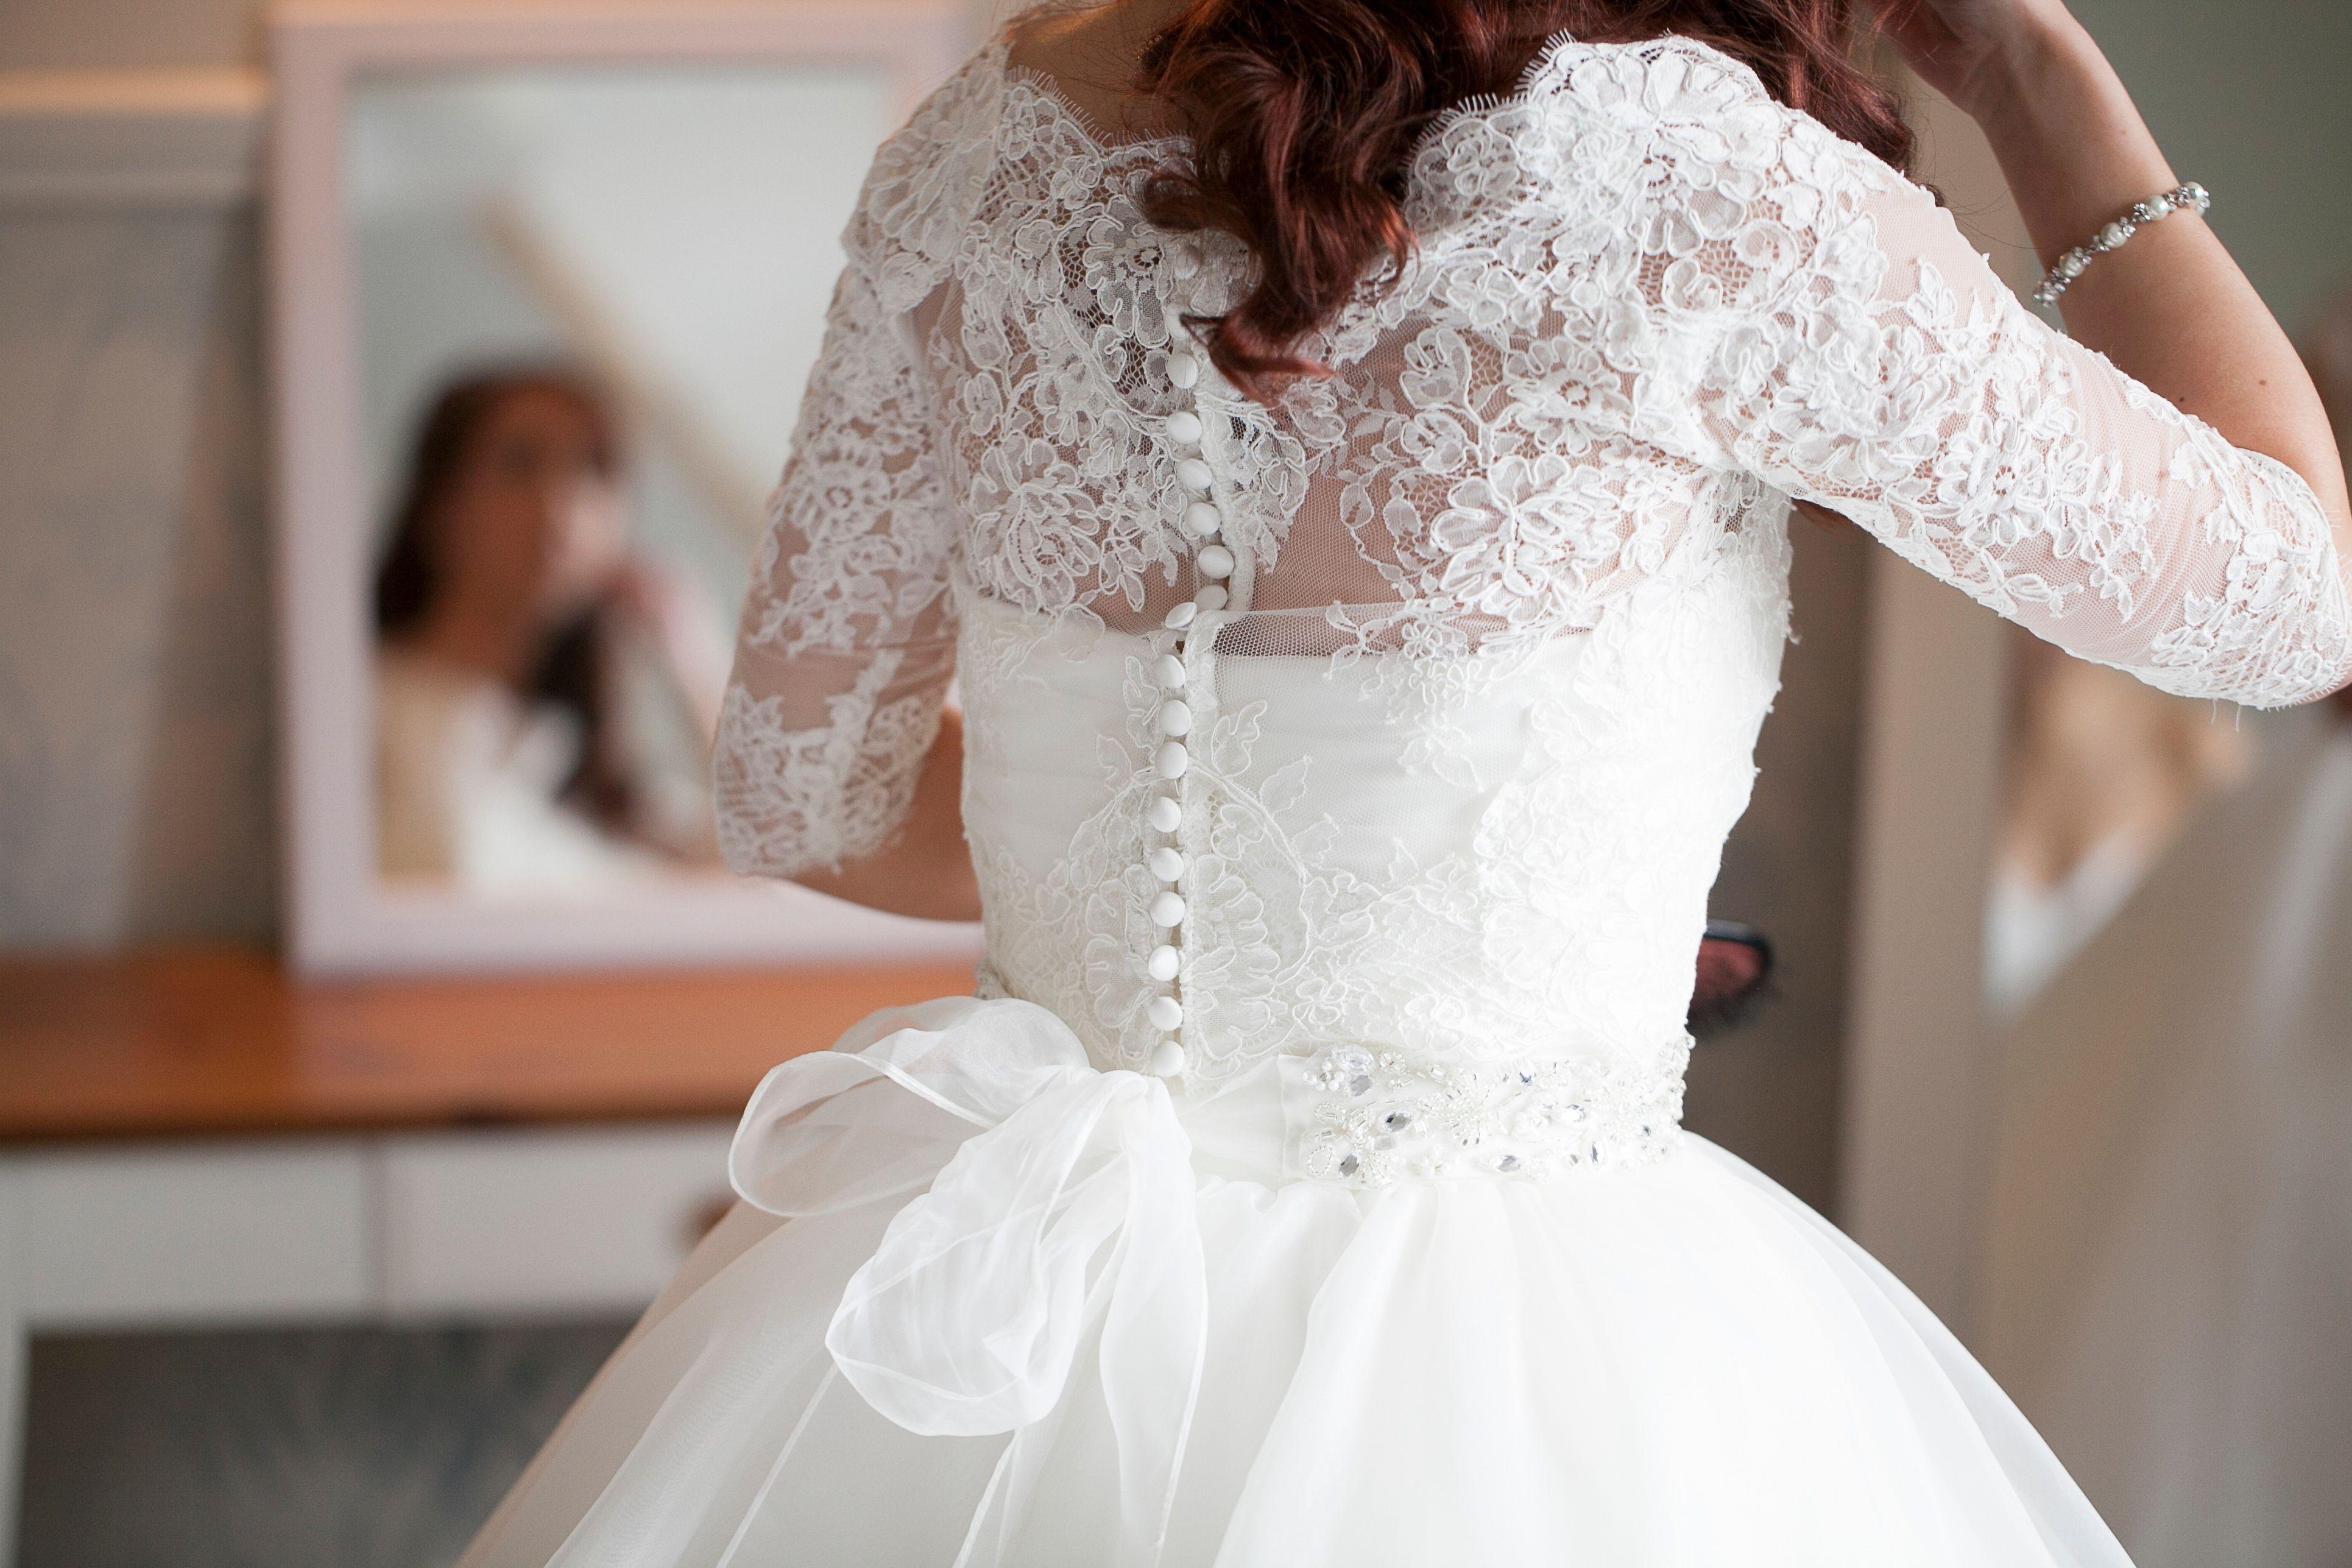 Custom lace coverup added to strapless dress wedding dress ideas